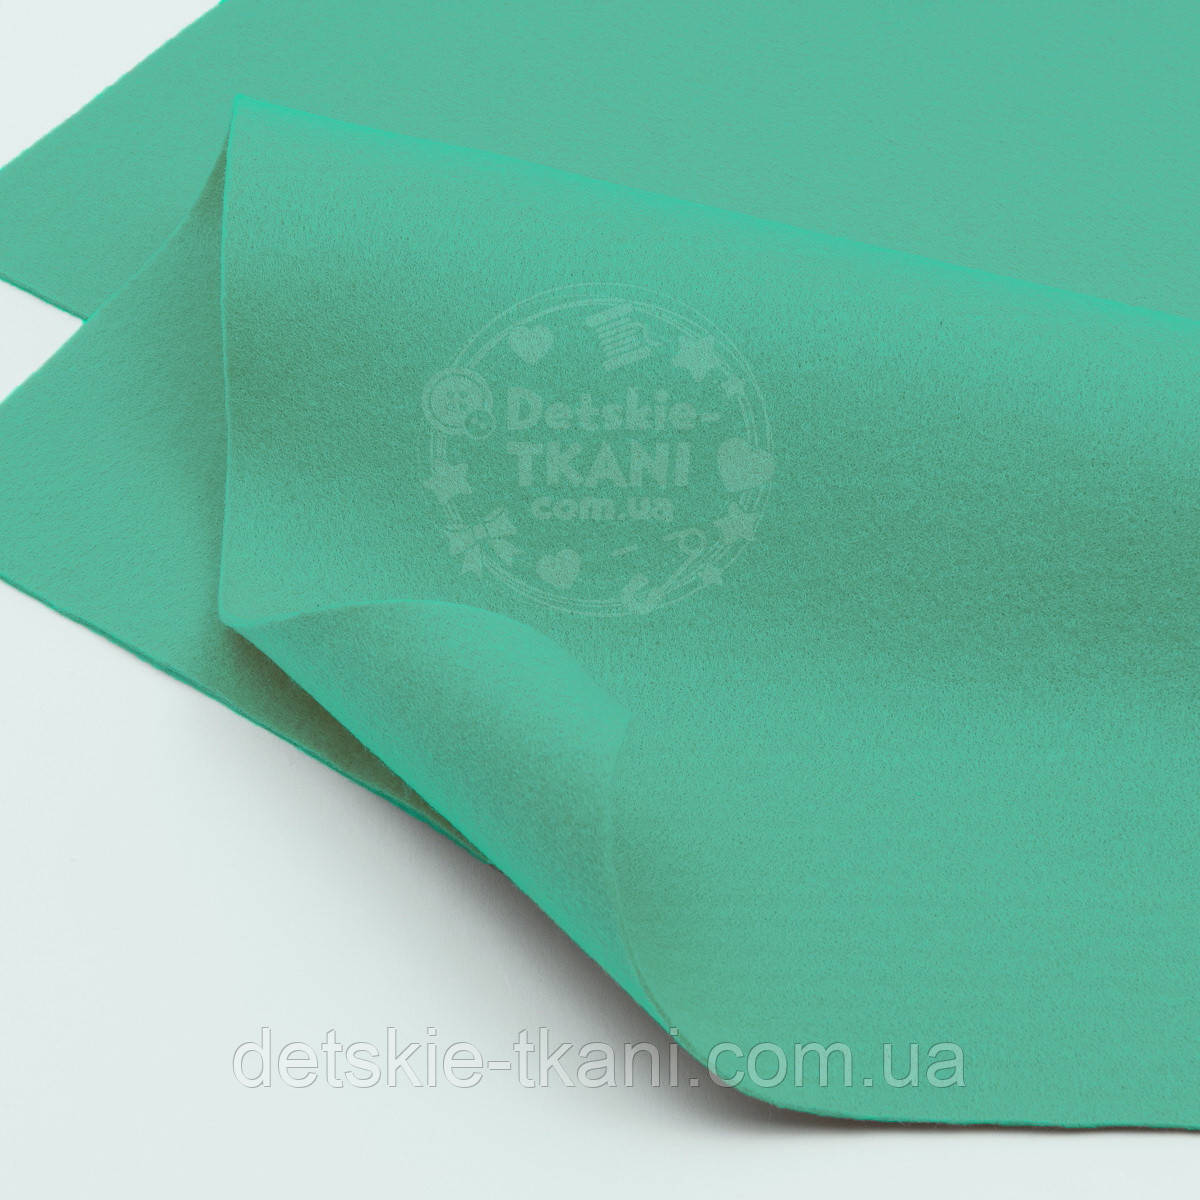 Лоскут фетра мятного цвета 20*21 см (ФМ-26)